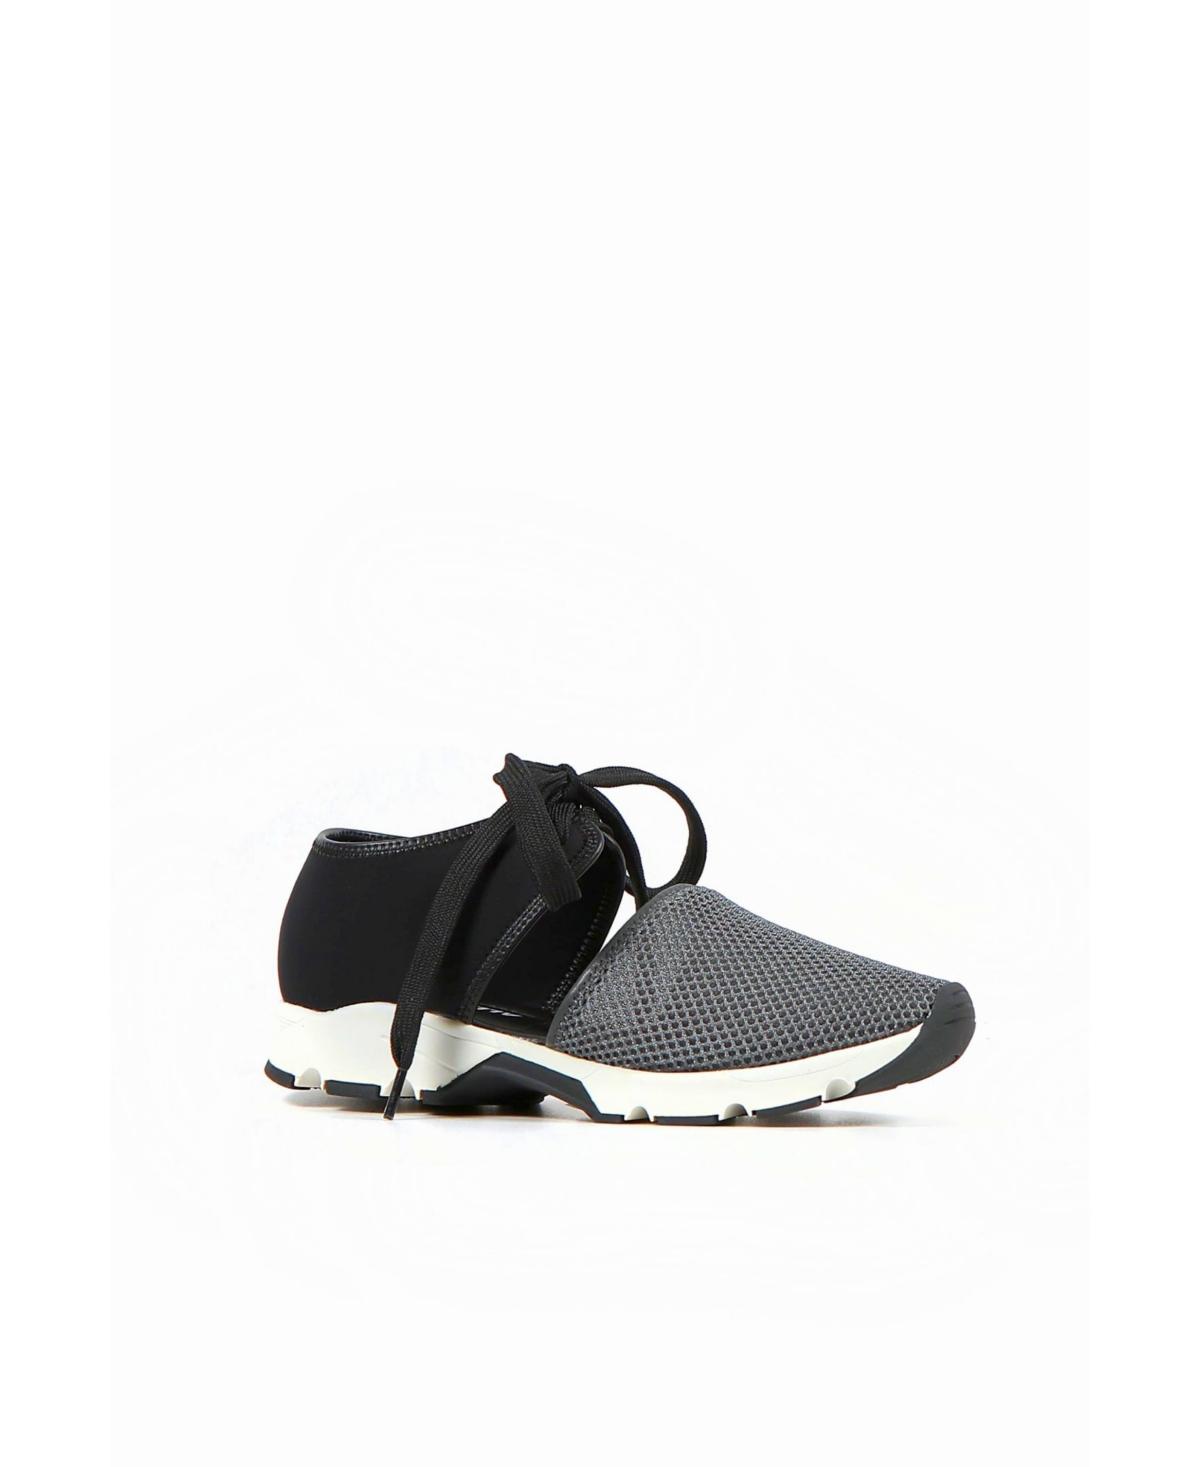 Women's Solid Mesh Sneaker Women's Shoes